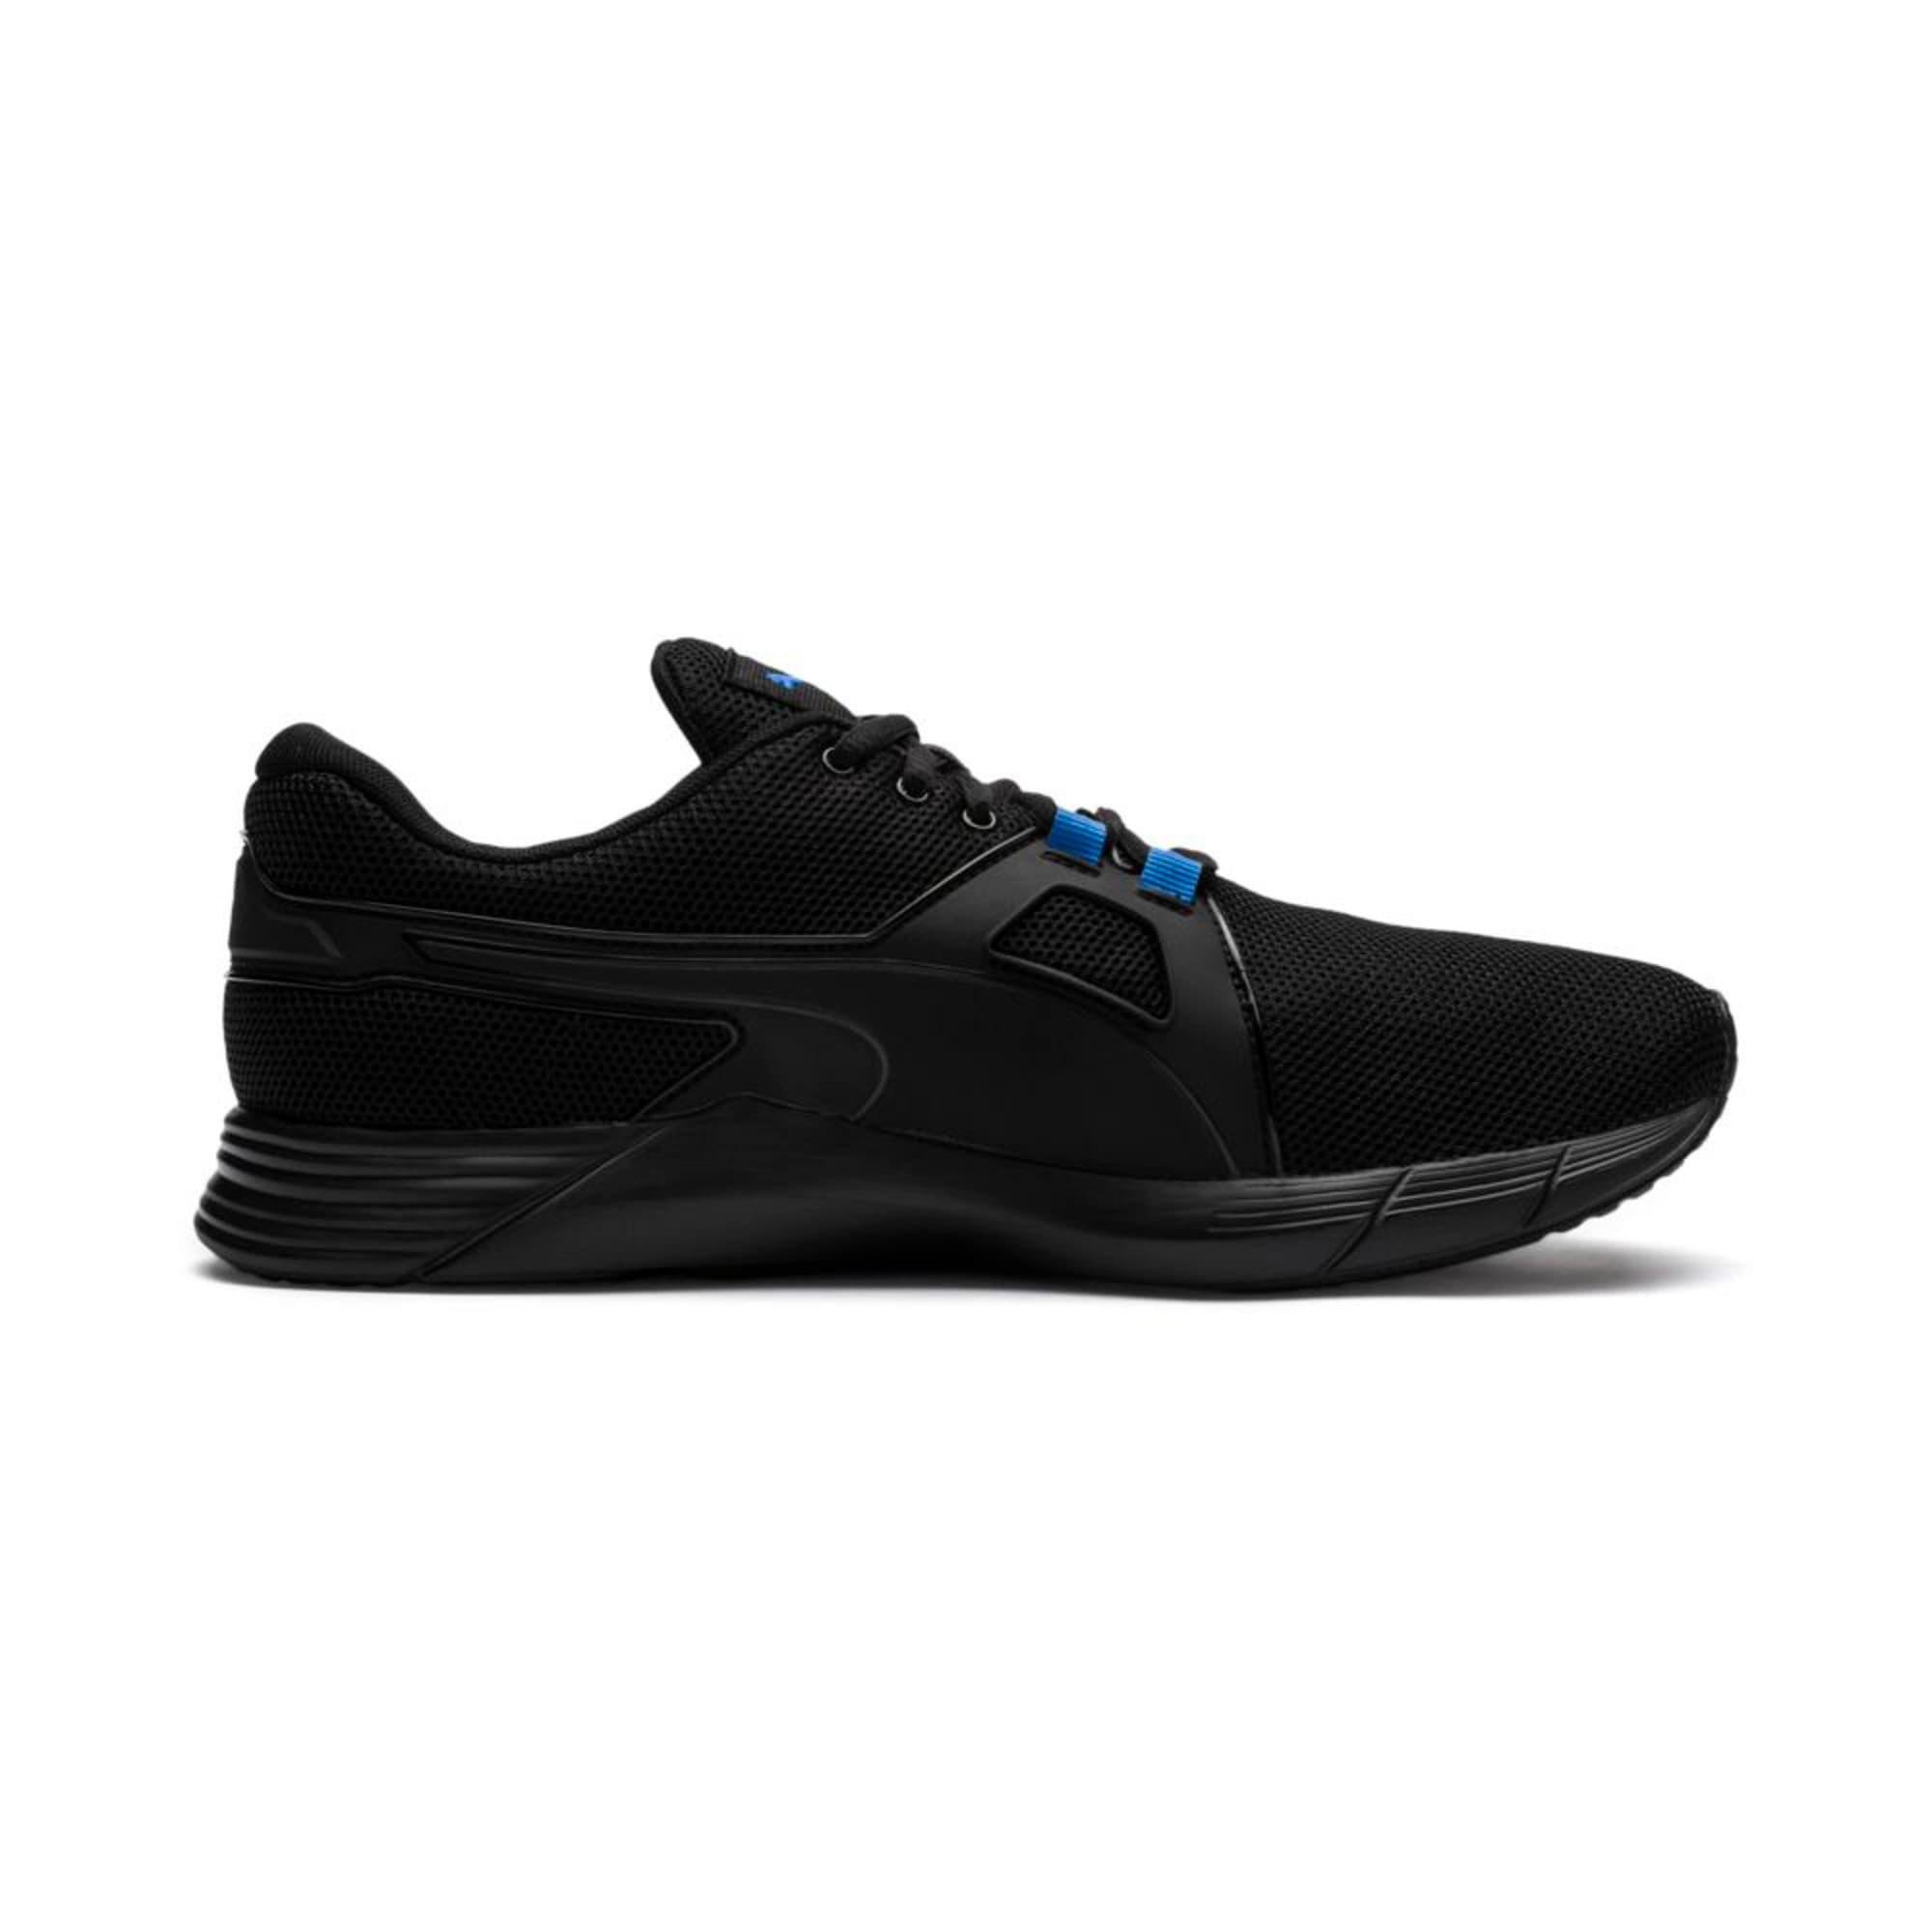 Thumbnail 5 of Propel XT Men's Training Shoes, Puma Black-Strong Blue, medium-IND